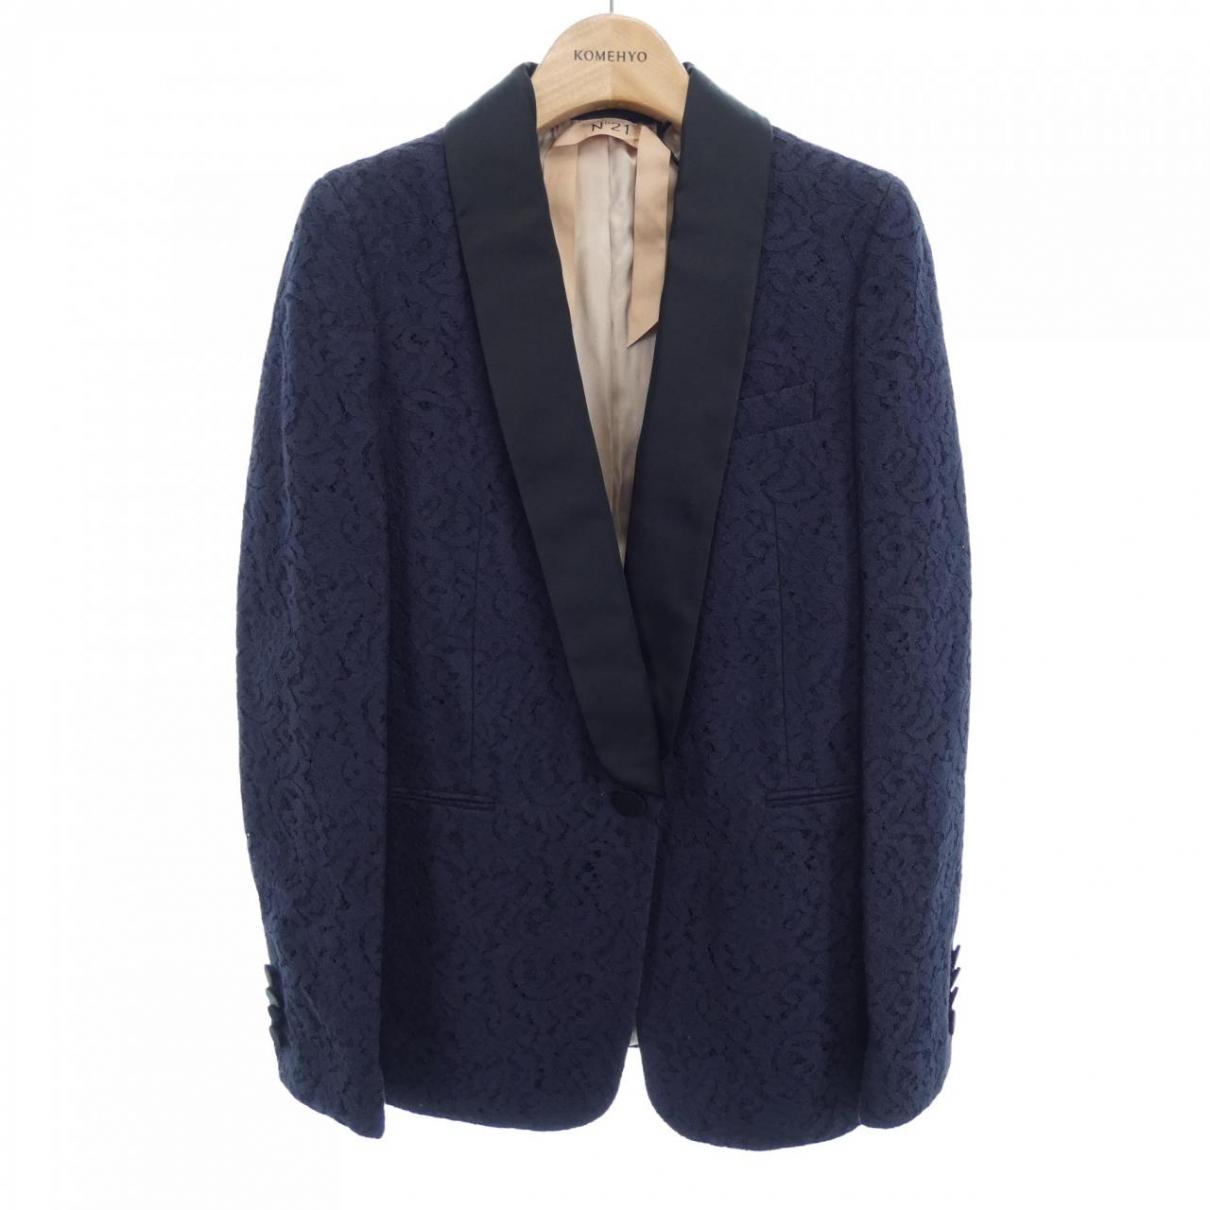 N°21 \N Navy Cotton jacket for Women 36 IT